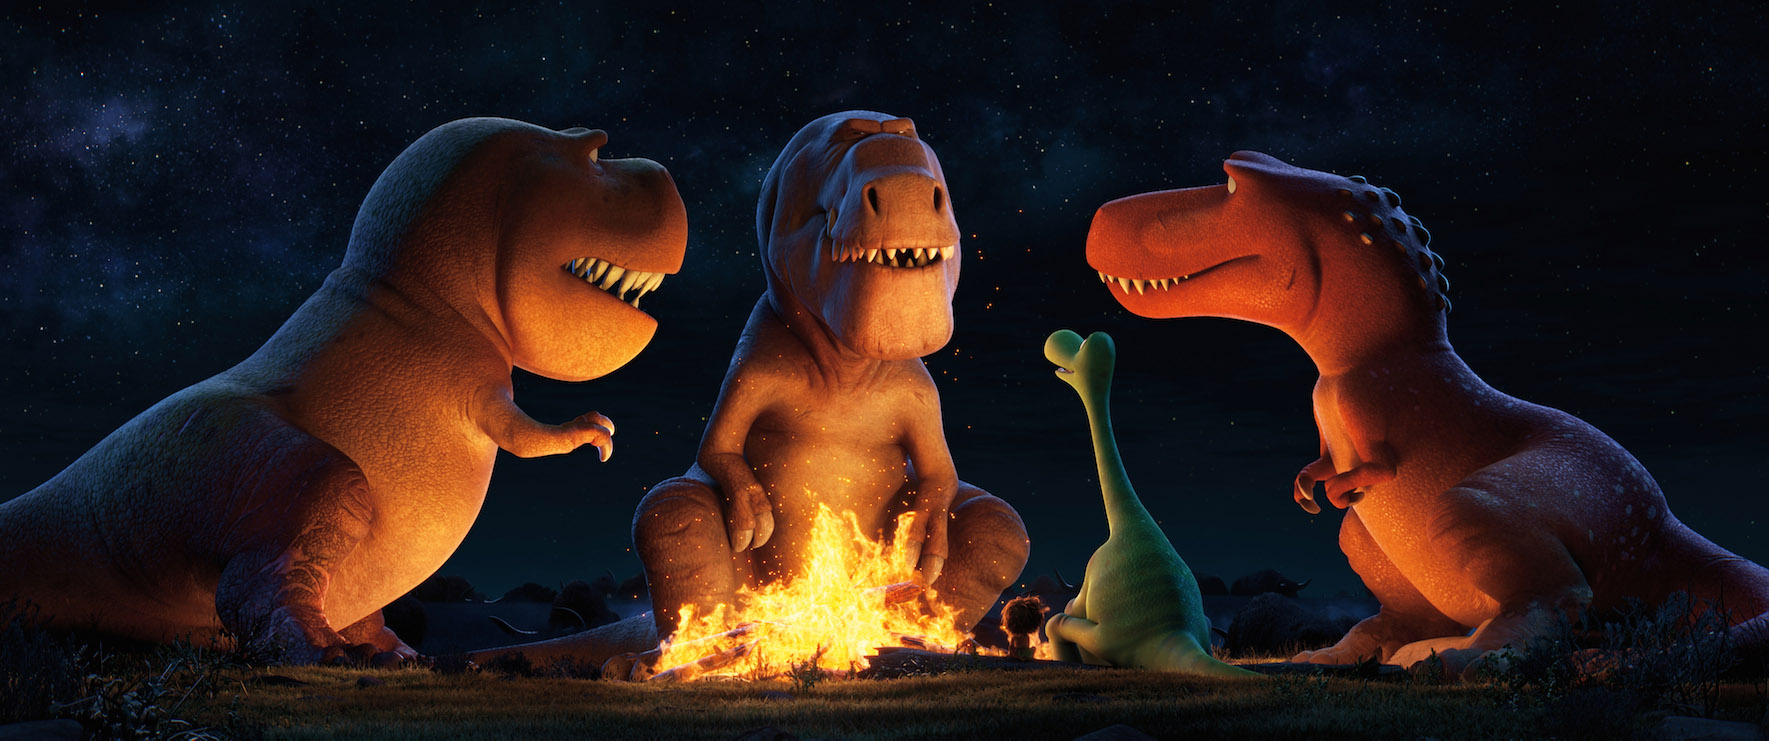 """The Good Dinosaur:"" A Sneak Peek of Pixar's Visual Mastery"